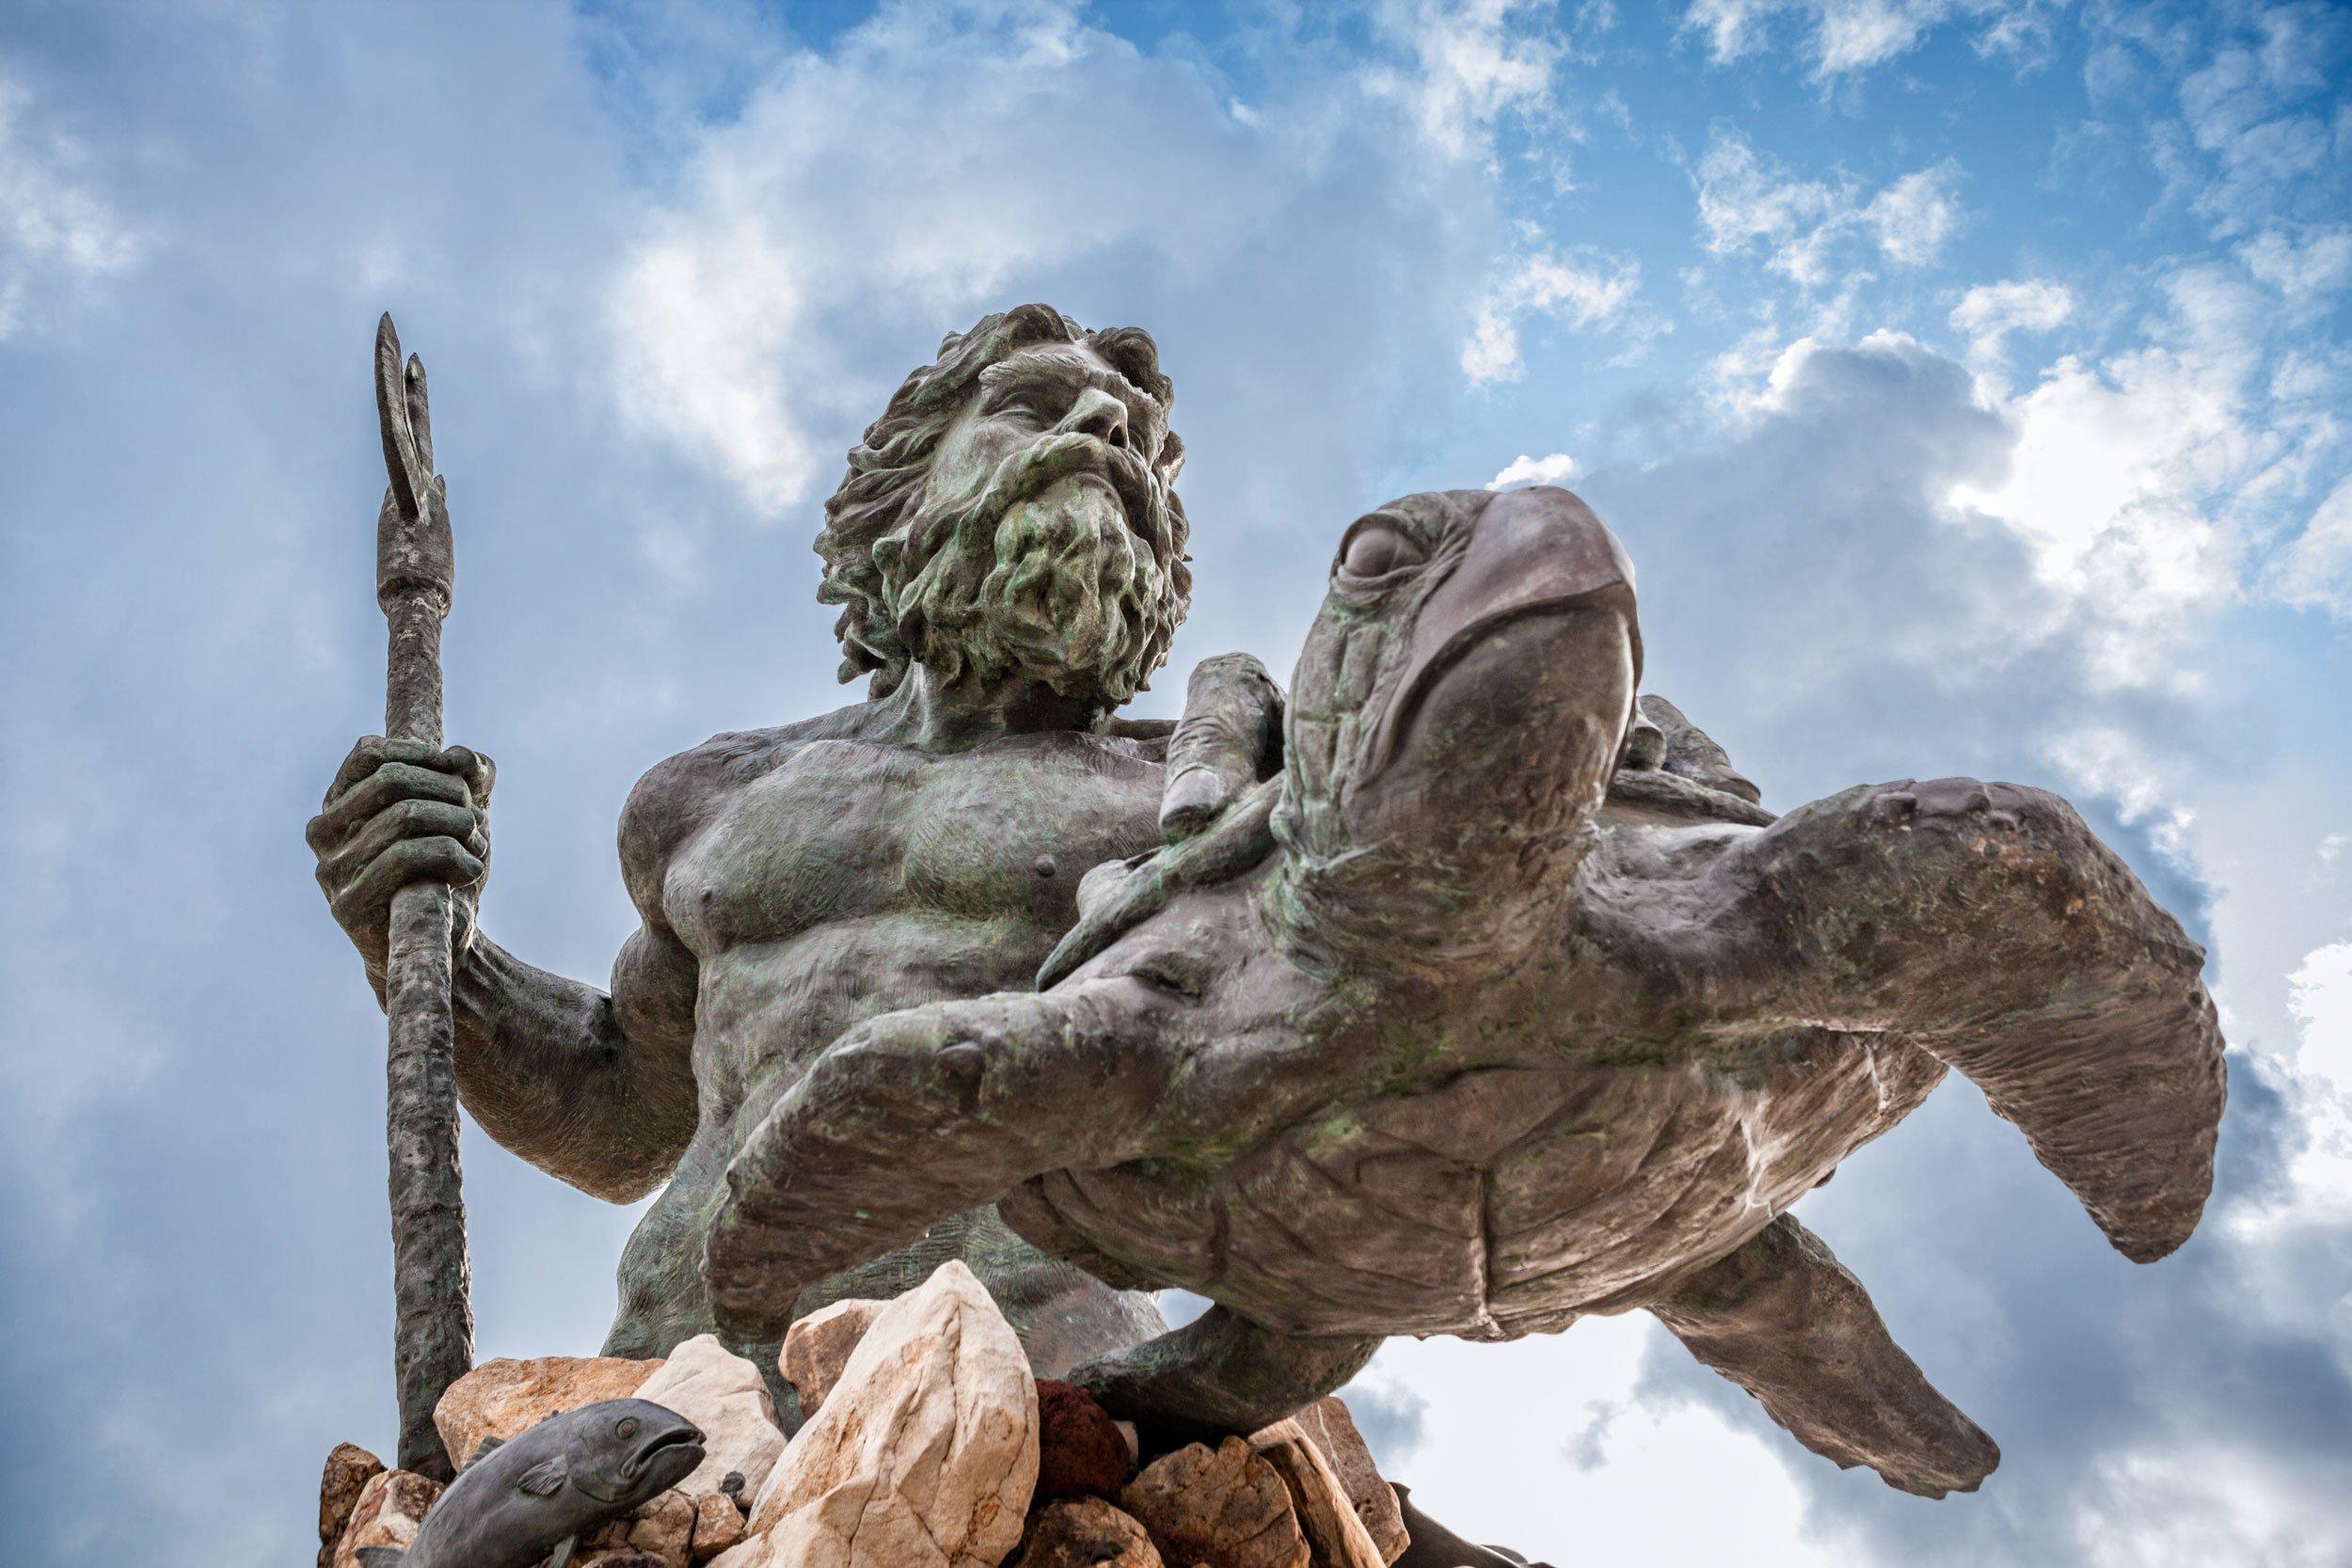 Neptune statue at Virginia Beach | 2 Week Virginia Road Trip from Washington DC